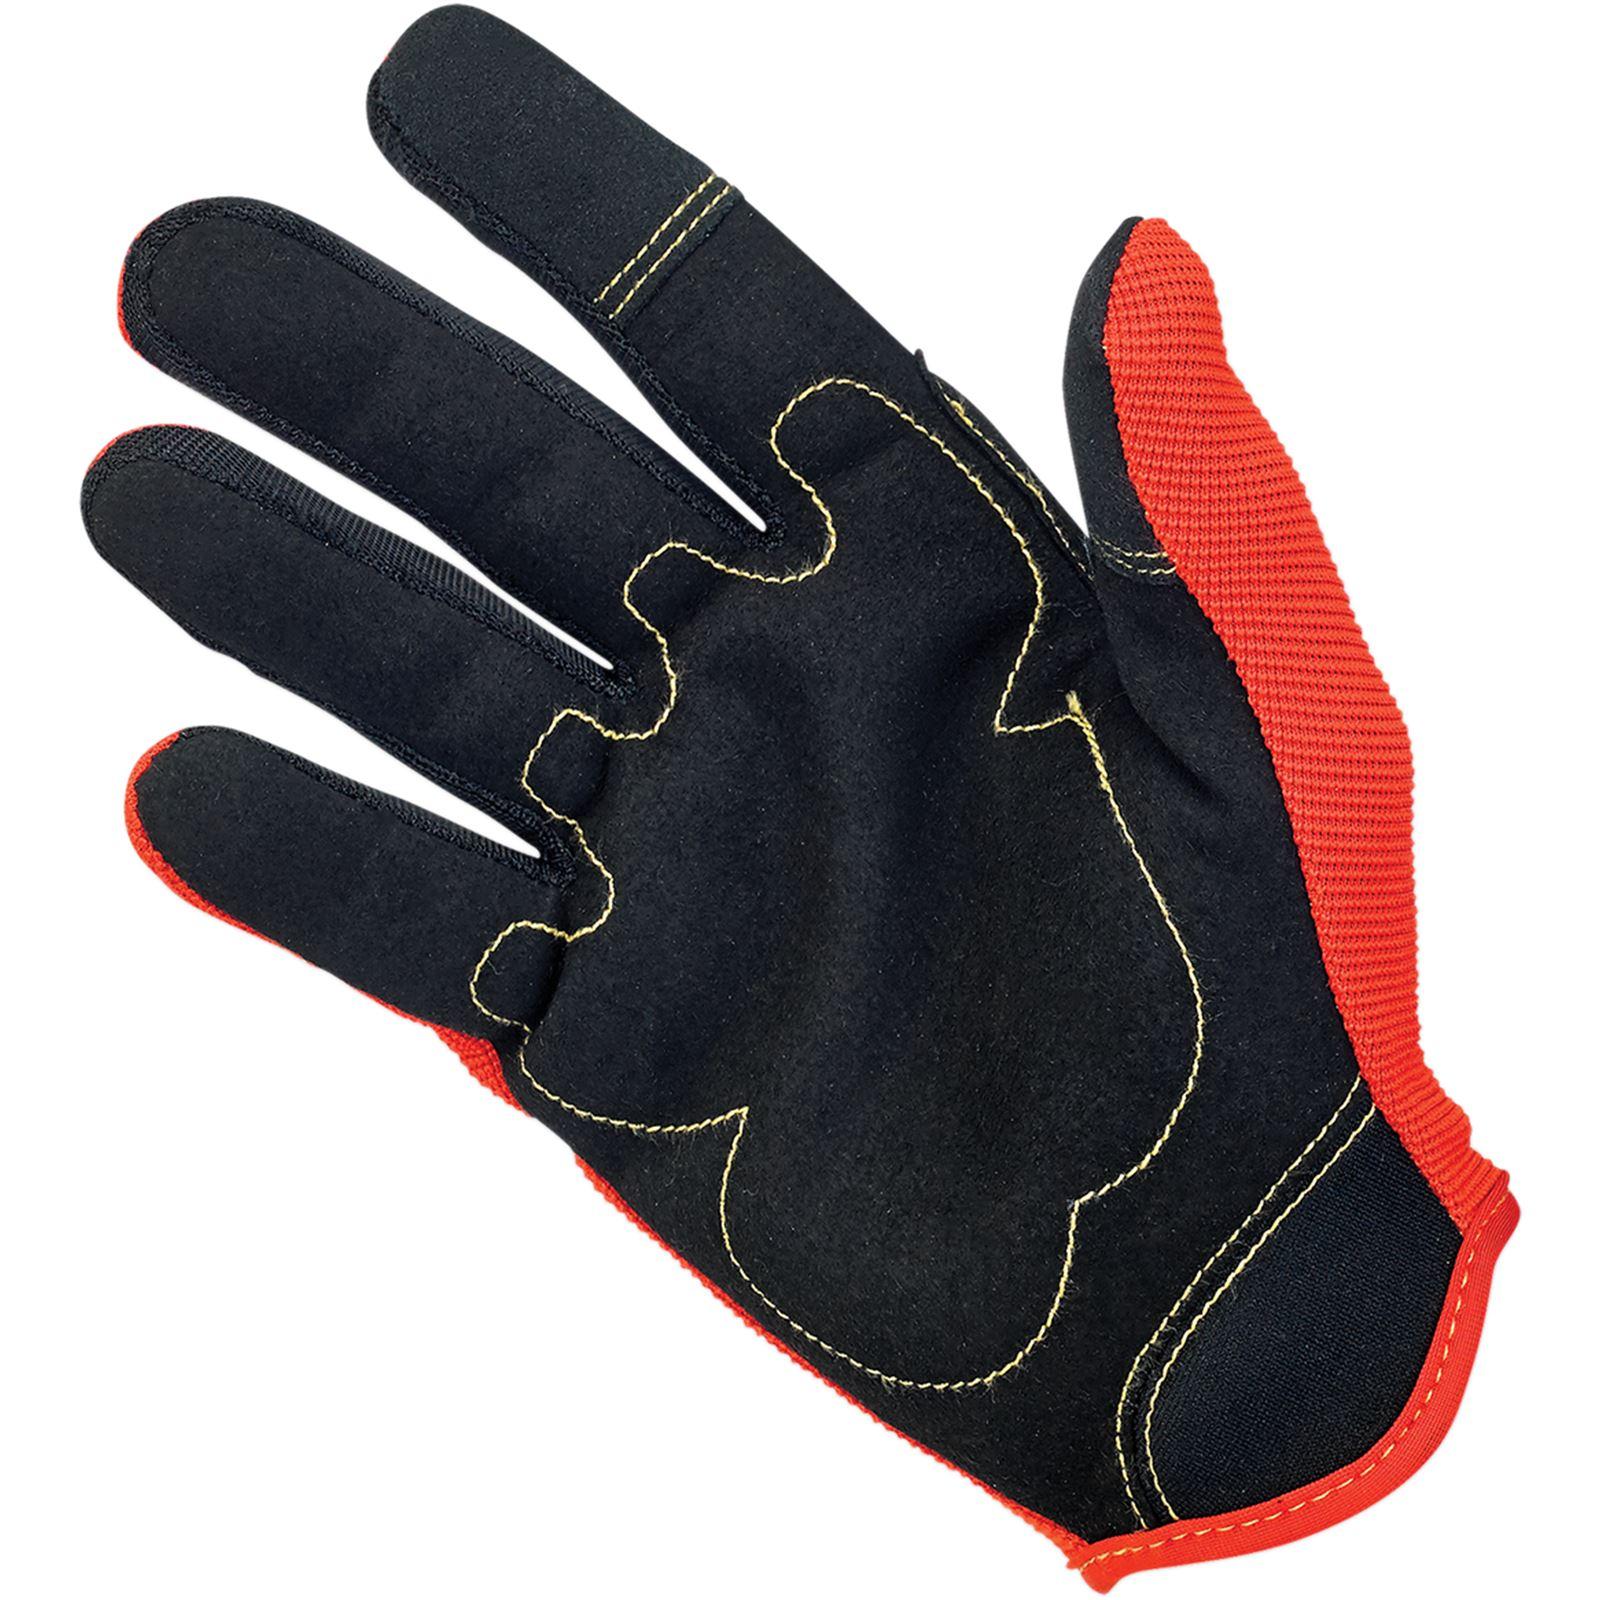 Biltwell Inc. Moto Gloves - Brown/Orange/Yellow - 2X-Large